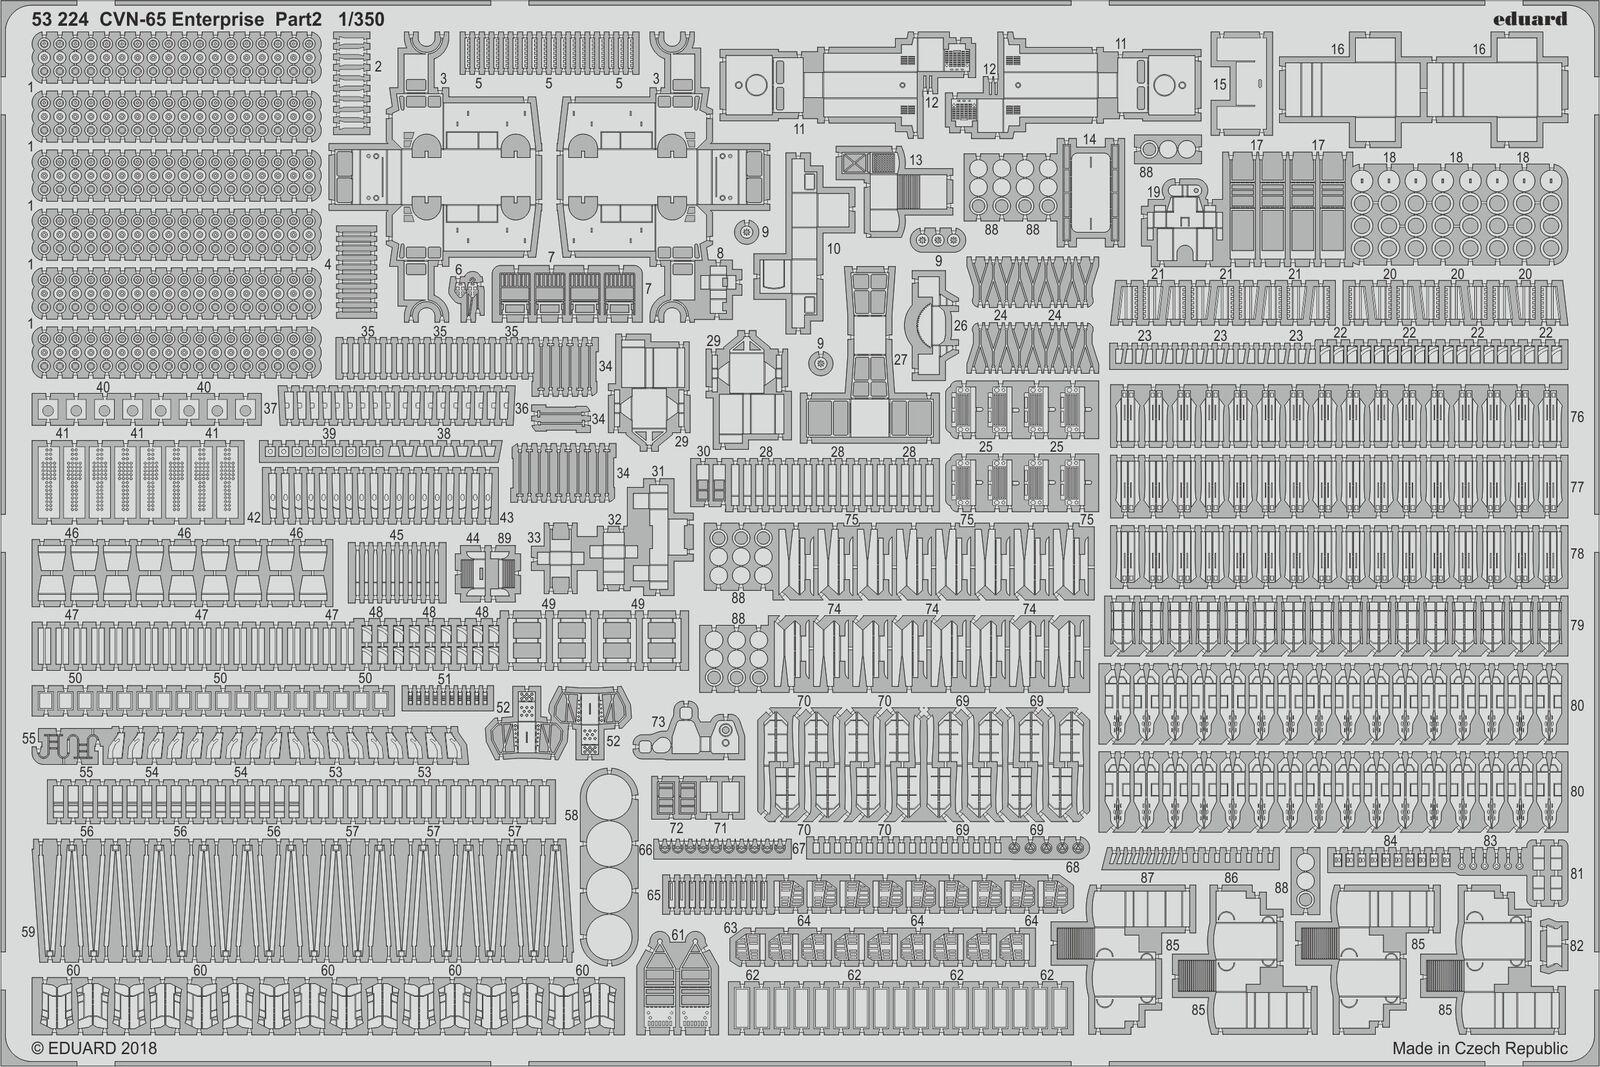 descuento Eduard 1 1 1 350 Uss Enterprise CVN-65 Parte 2  53224  70% de descuento